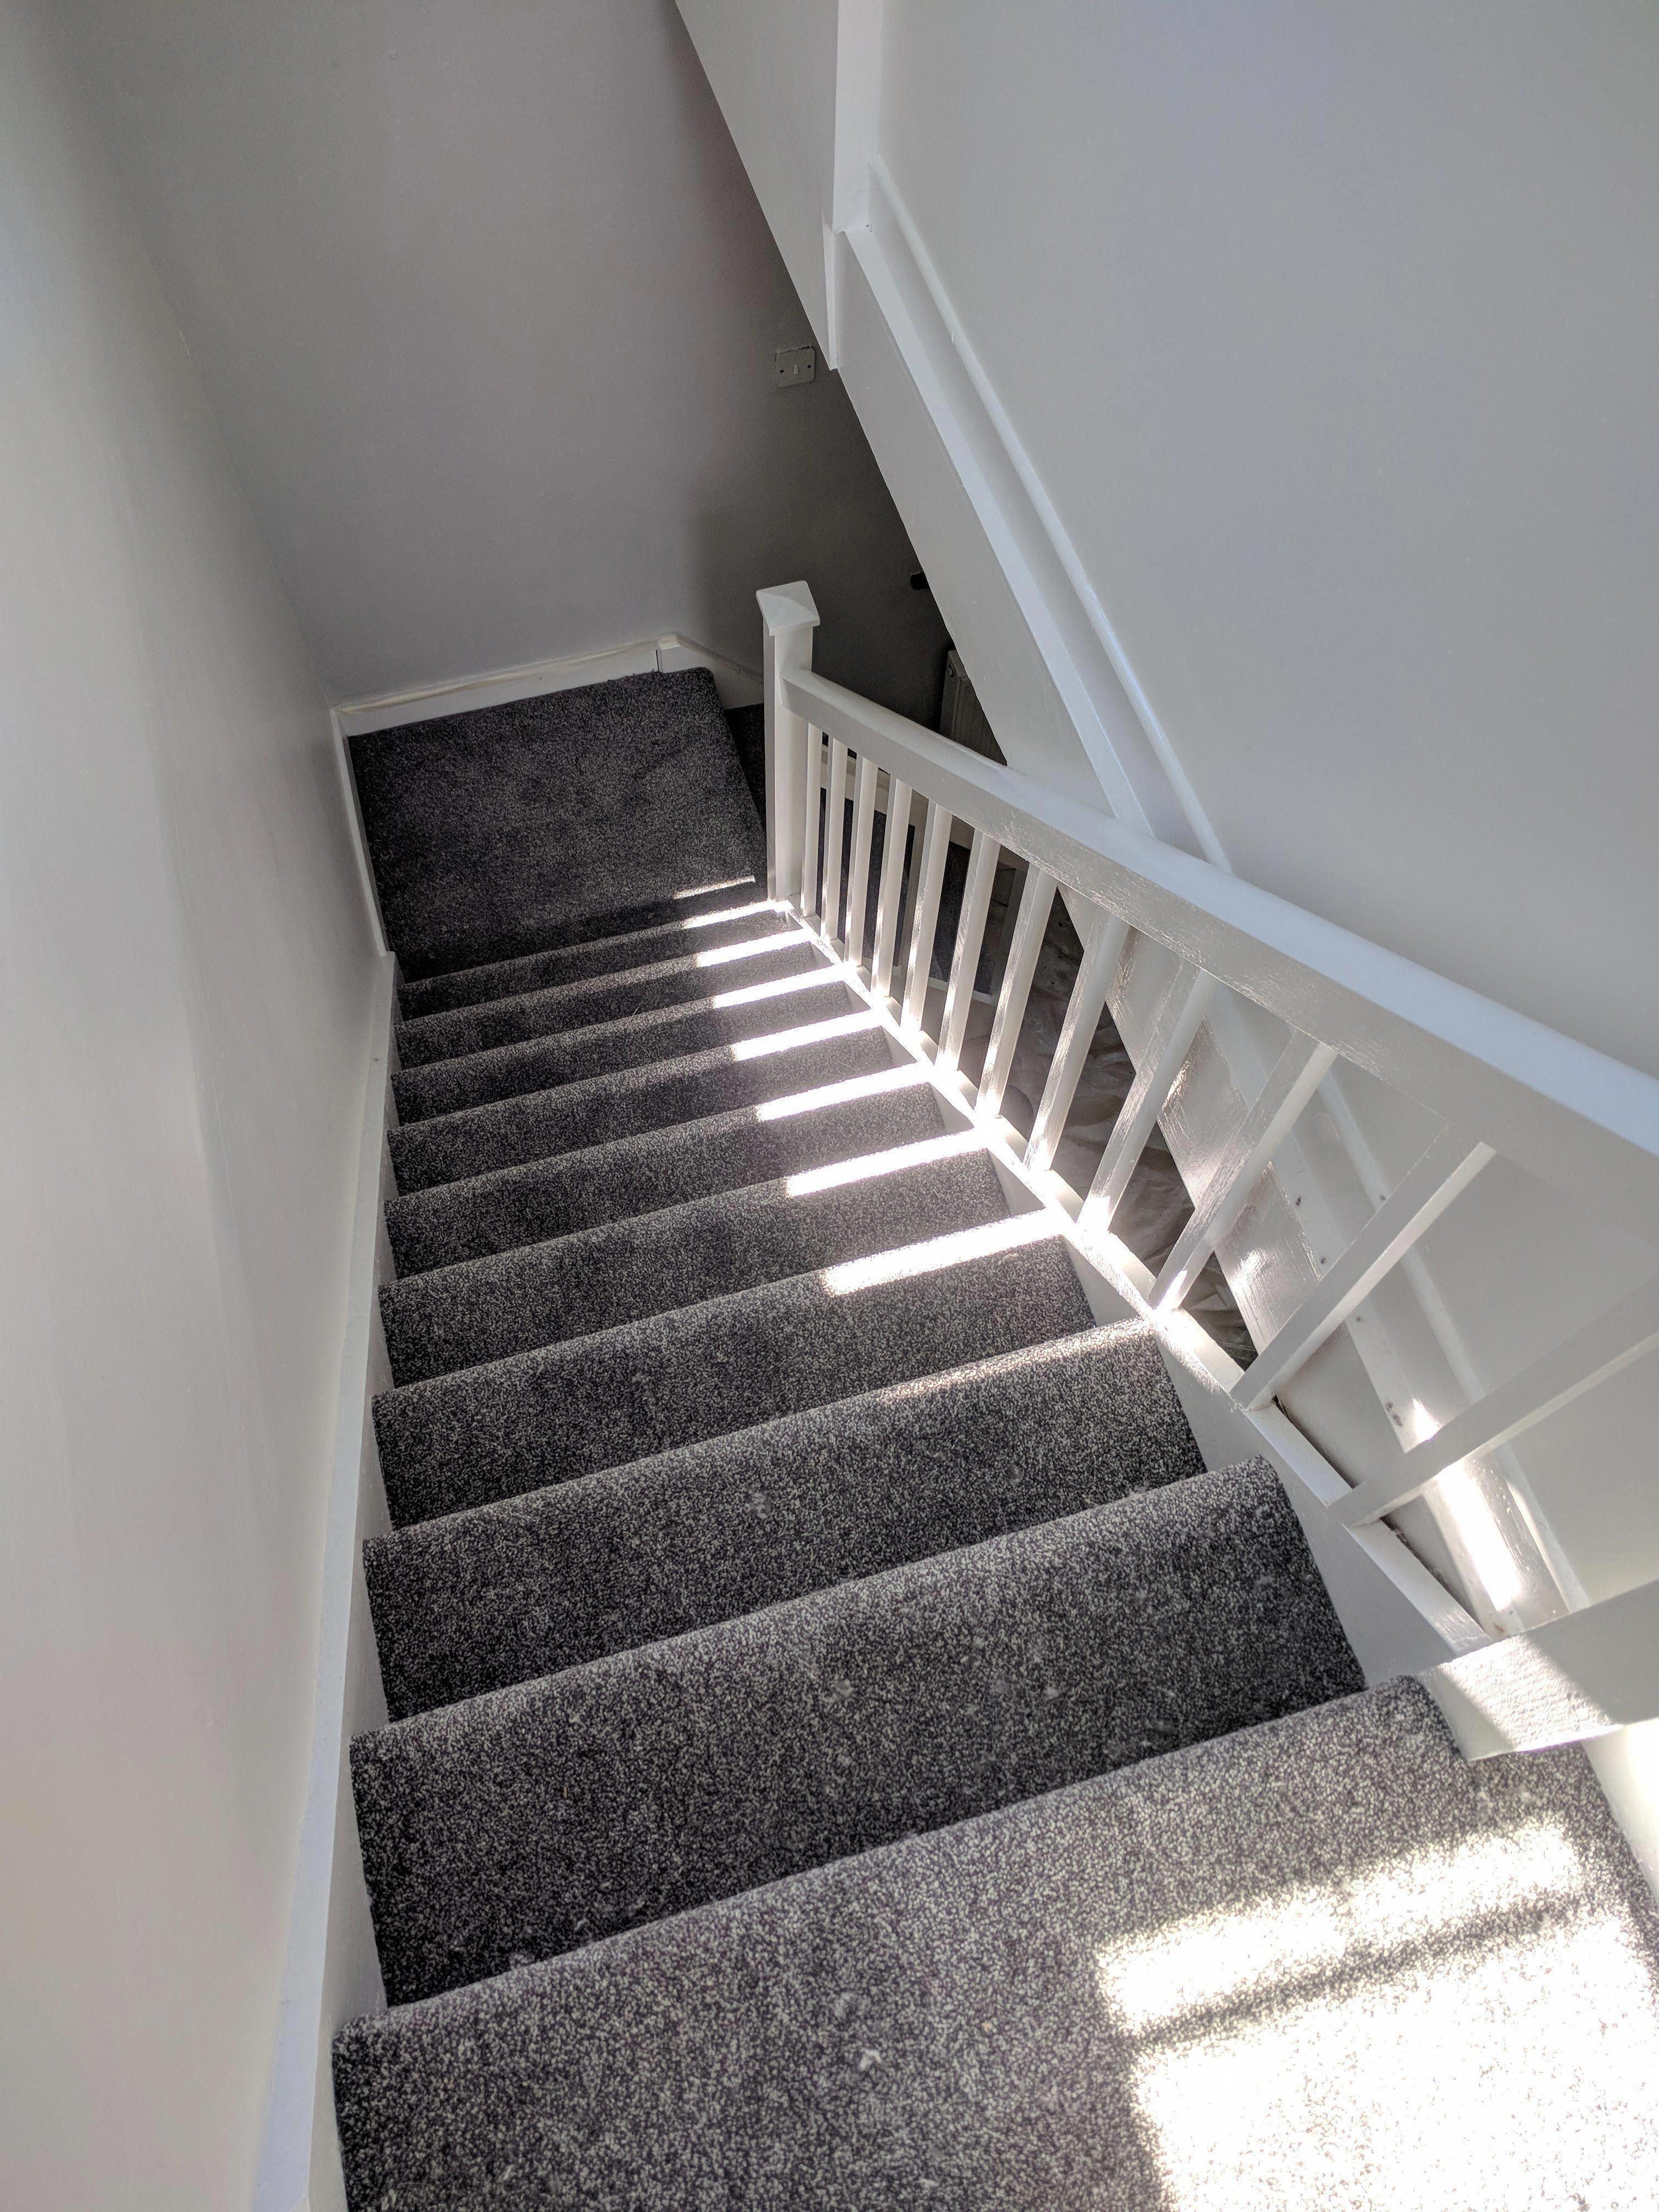 Carpet Runners Uk Voucher Code Staircarpetrunnersebay Id 6390321925 Carpetrunnersforsalenearme Carpet Stairs Grey Carpet Dark Grey Carpet Living Room